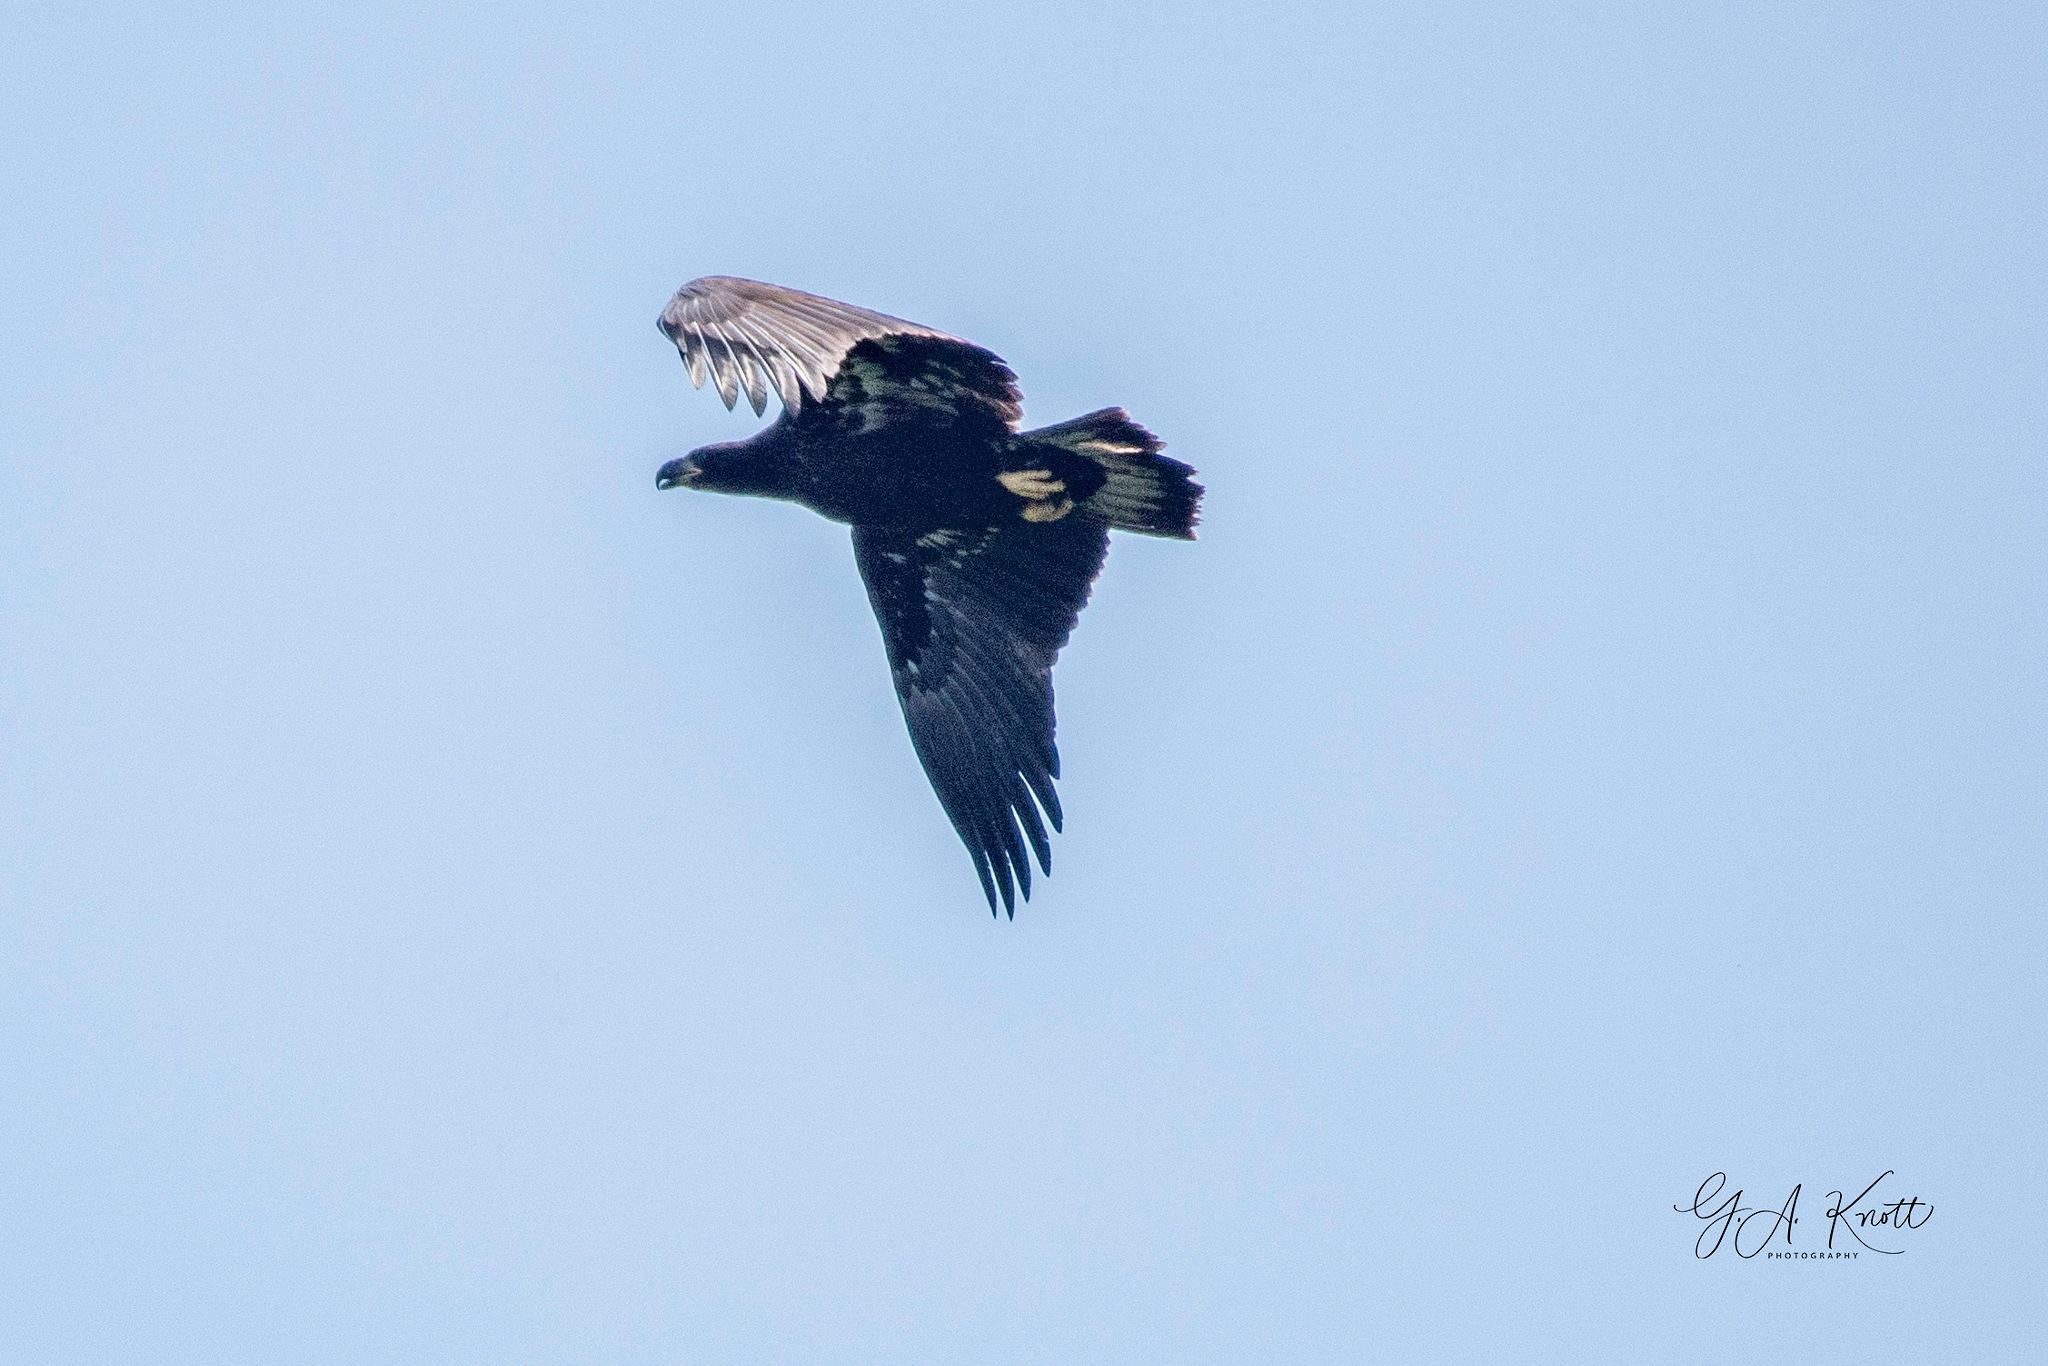 Juvenile Bald Eagle by Greg Knott